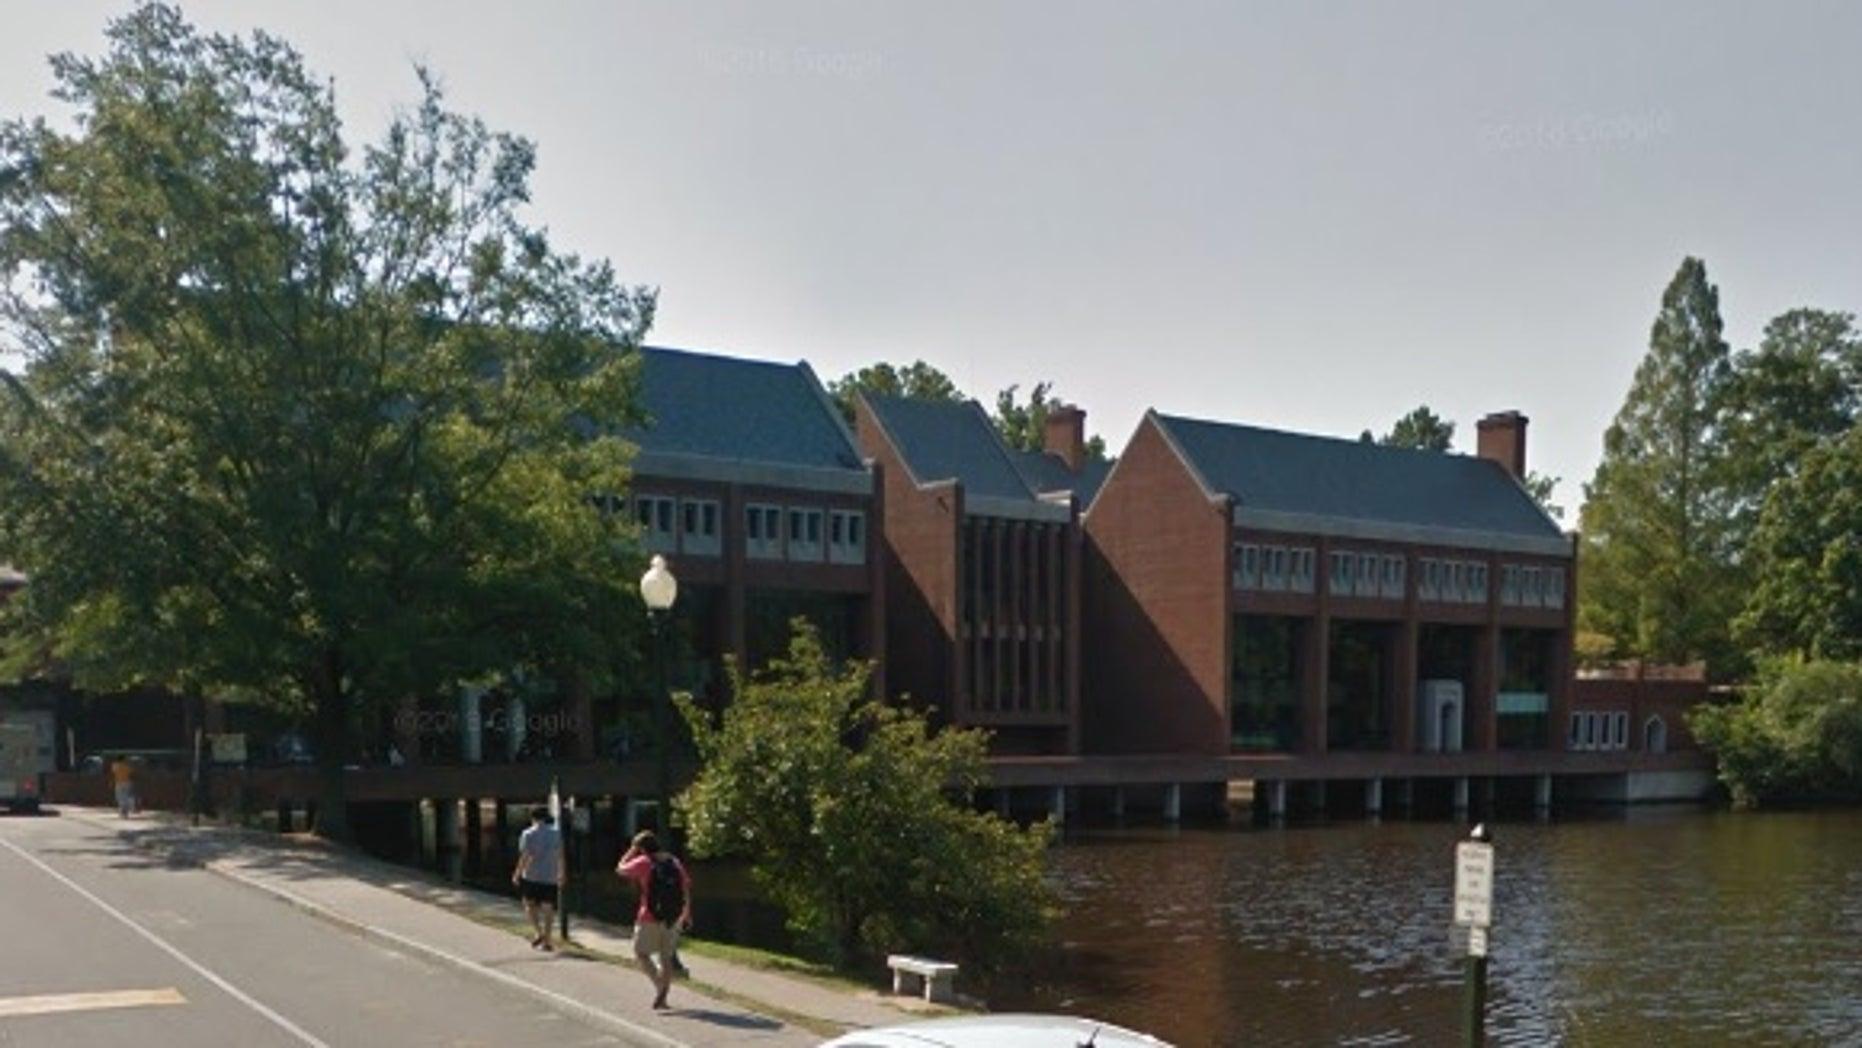 The University of Richmond campus.